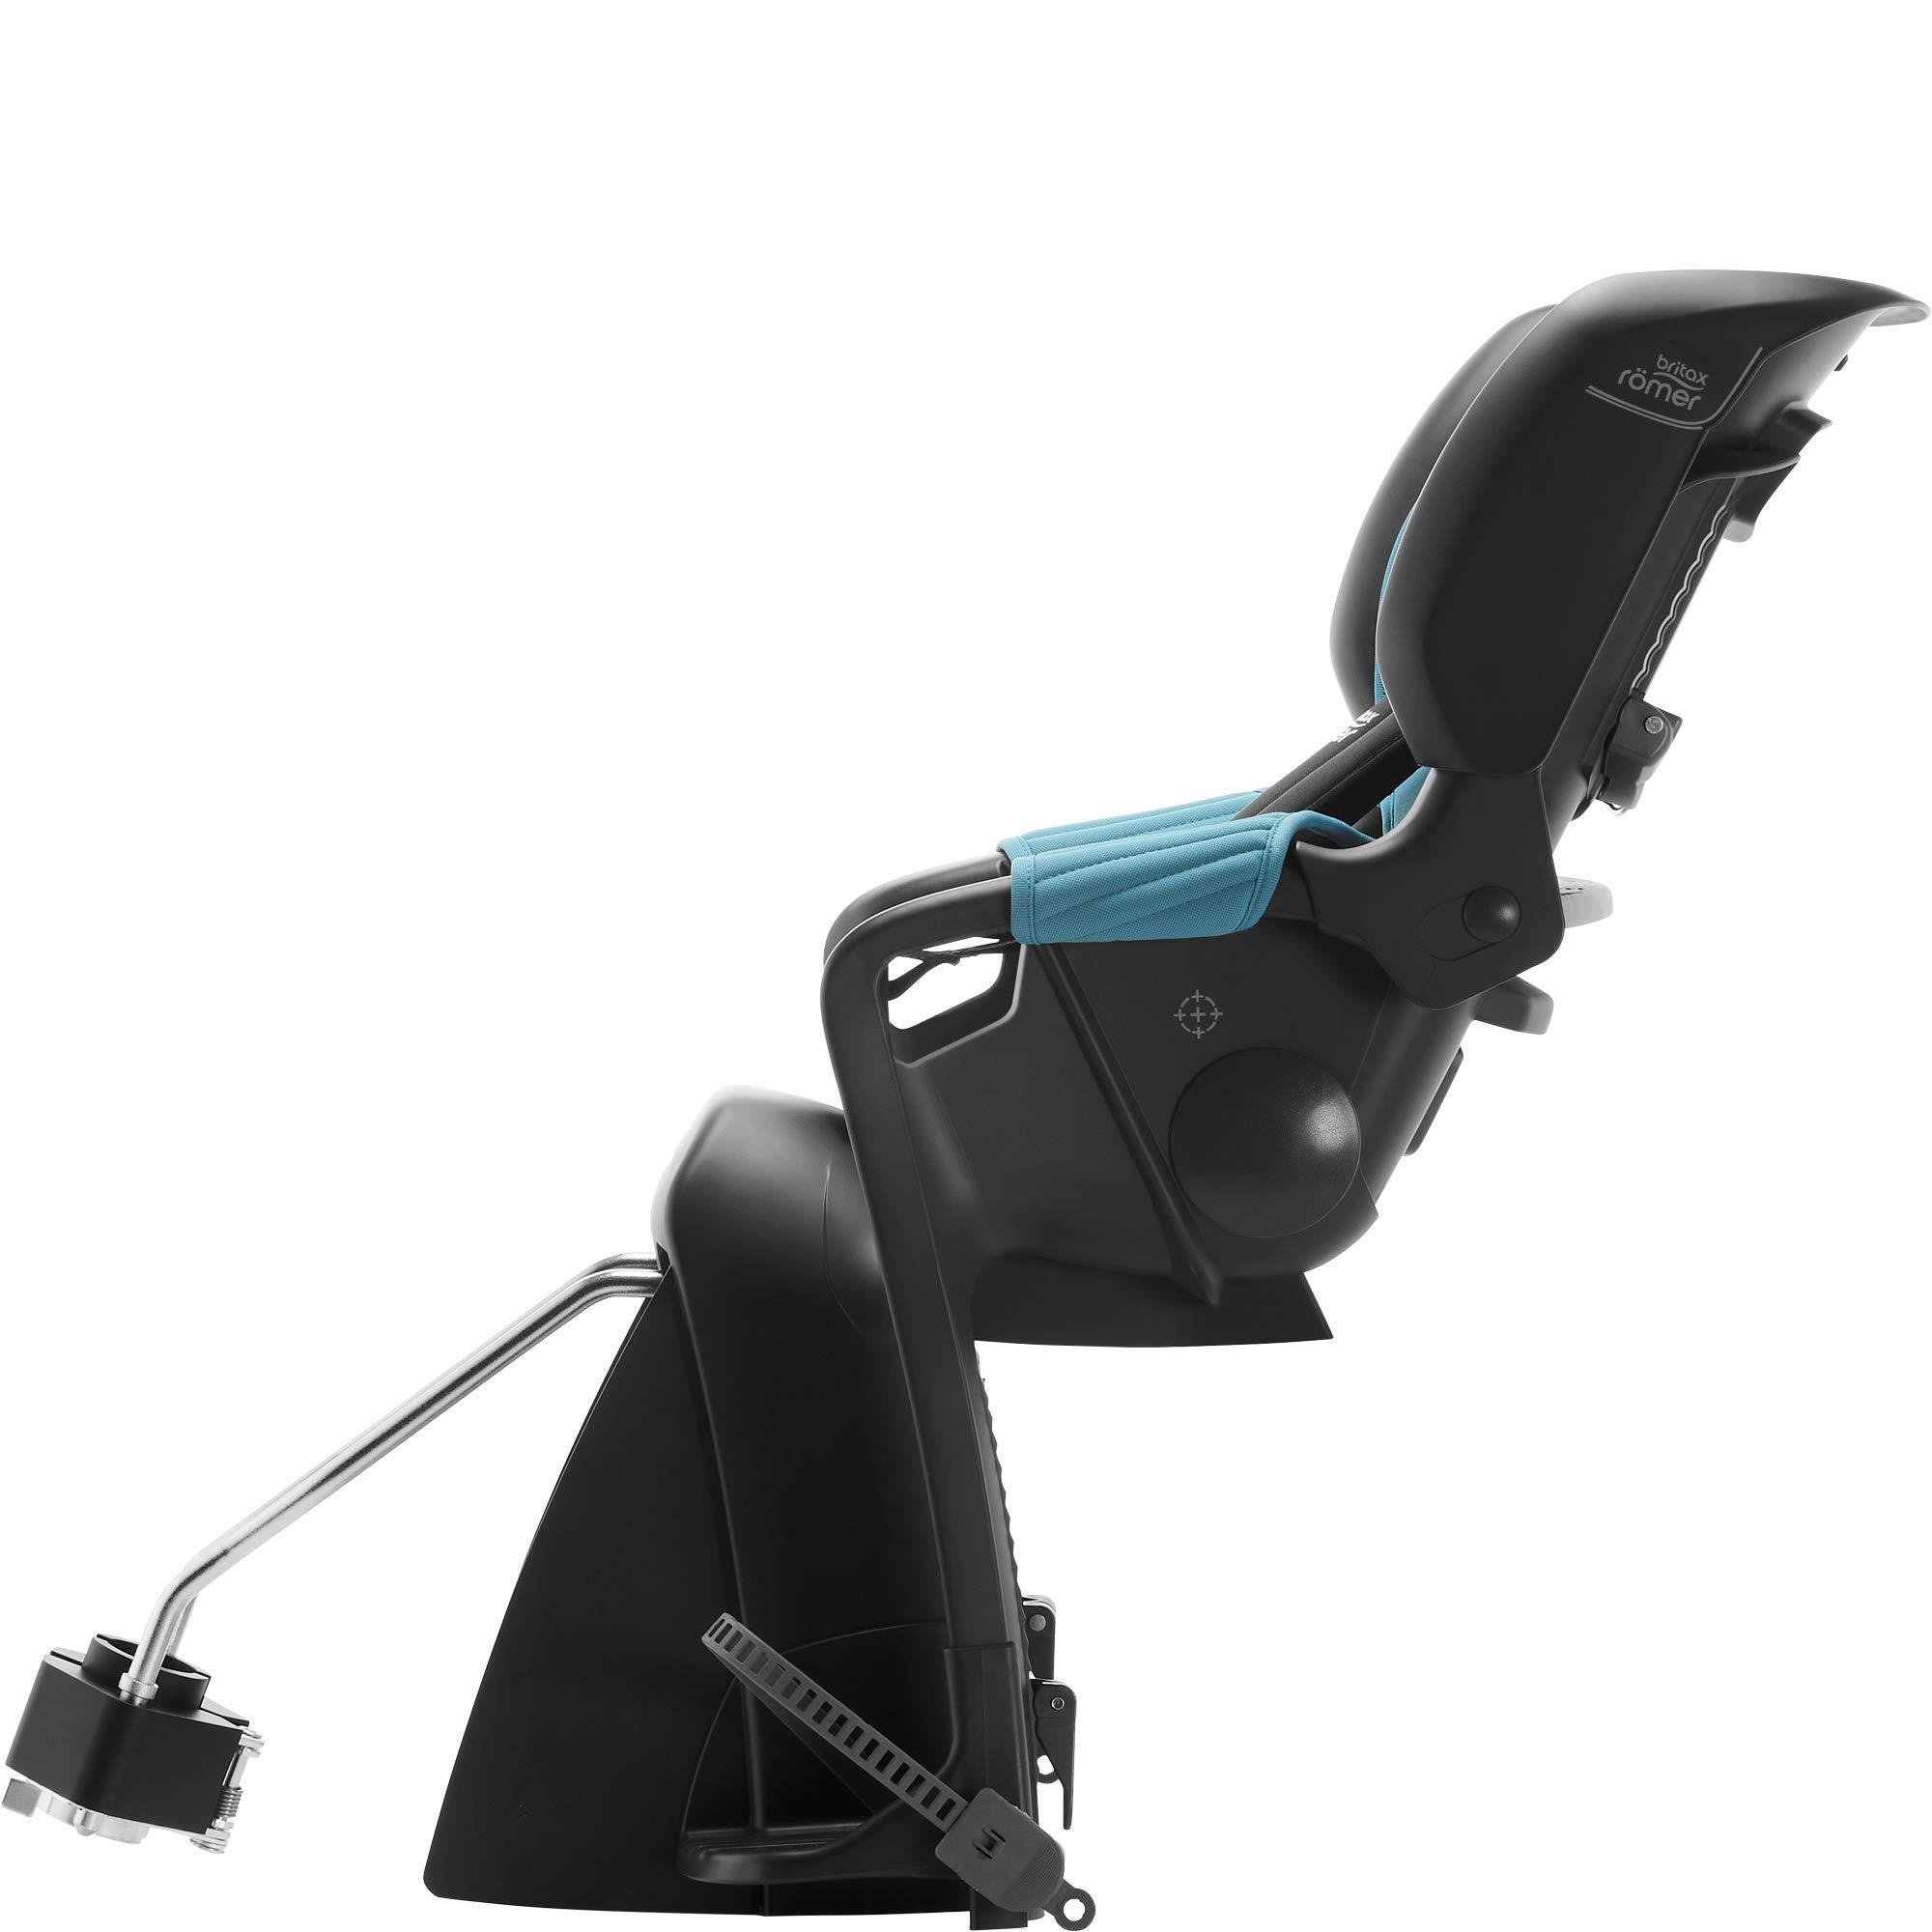 britax r mer jockey comfort fahrradsitz 9 22 kg. Black Bedroom Furniture Sets. Home Design Ideas